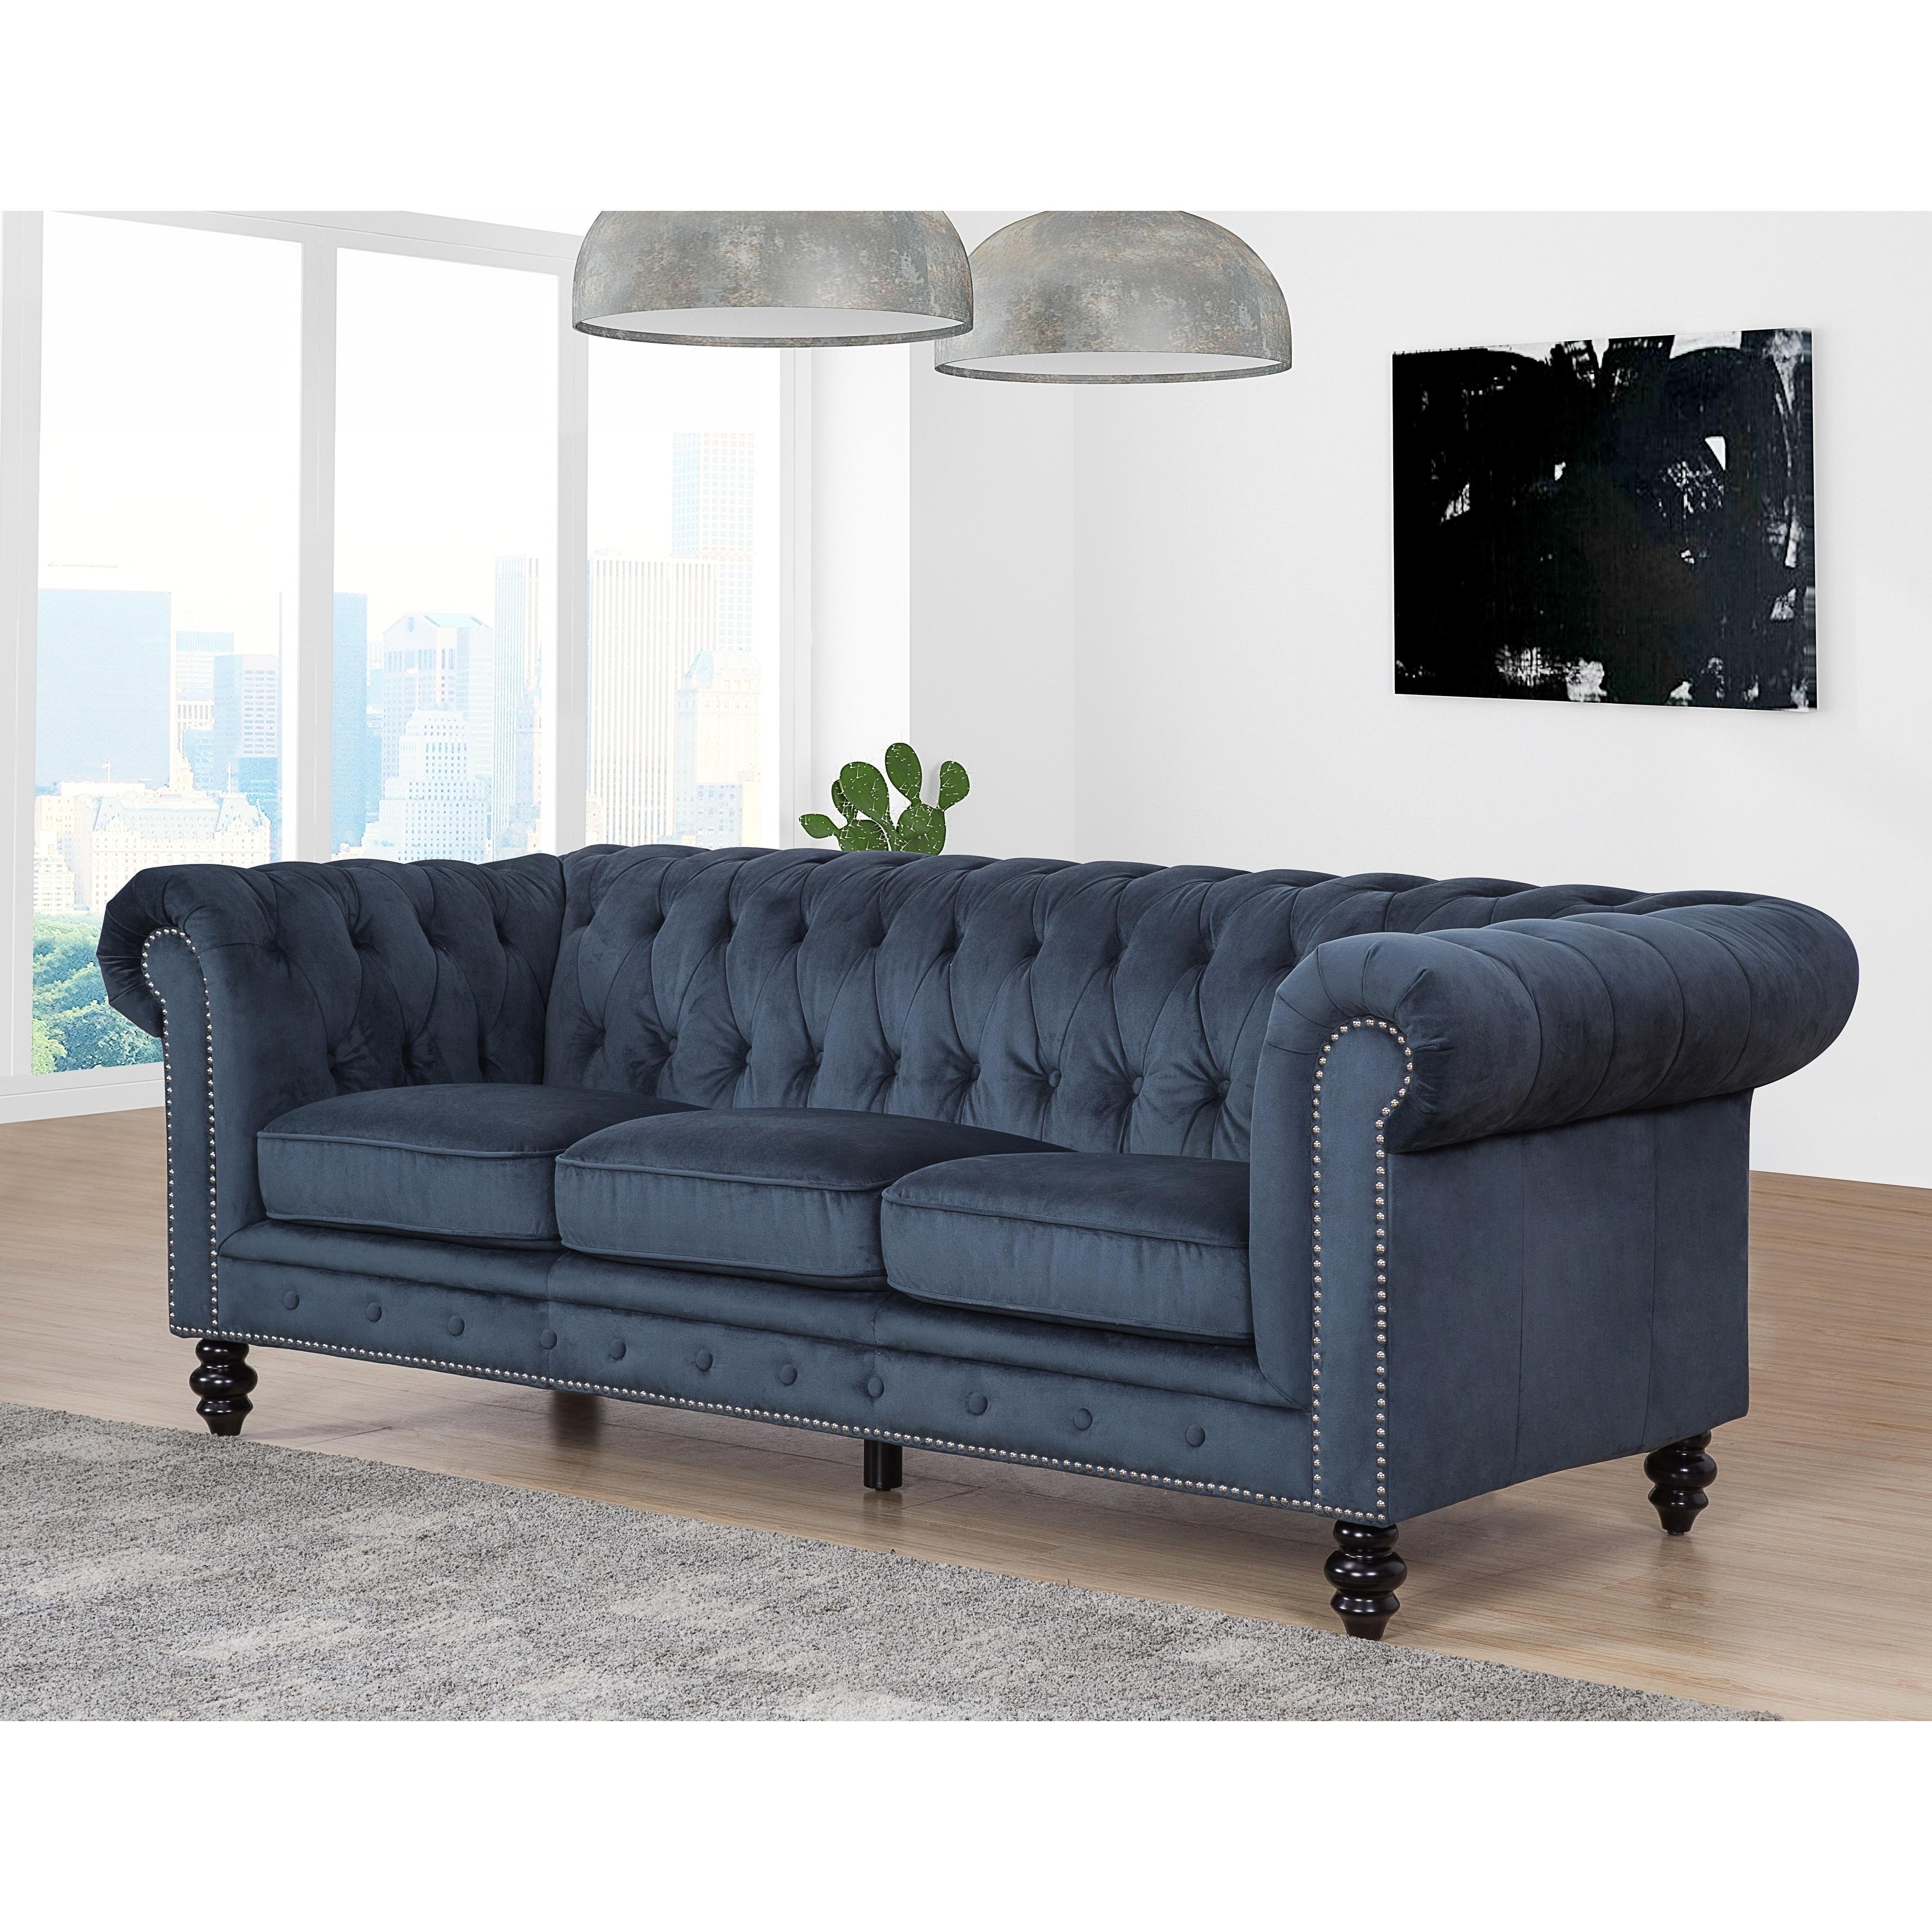 Gracewood Hollow Dib Velvet Sofa On Free Shipping Today 23122680